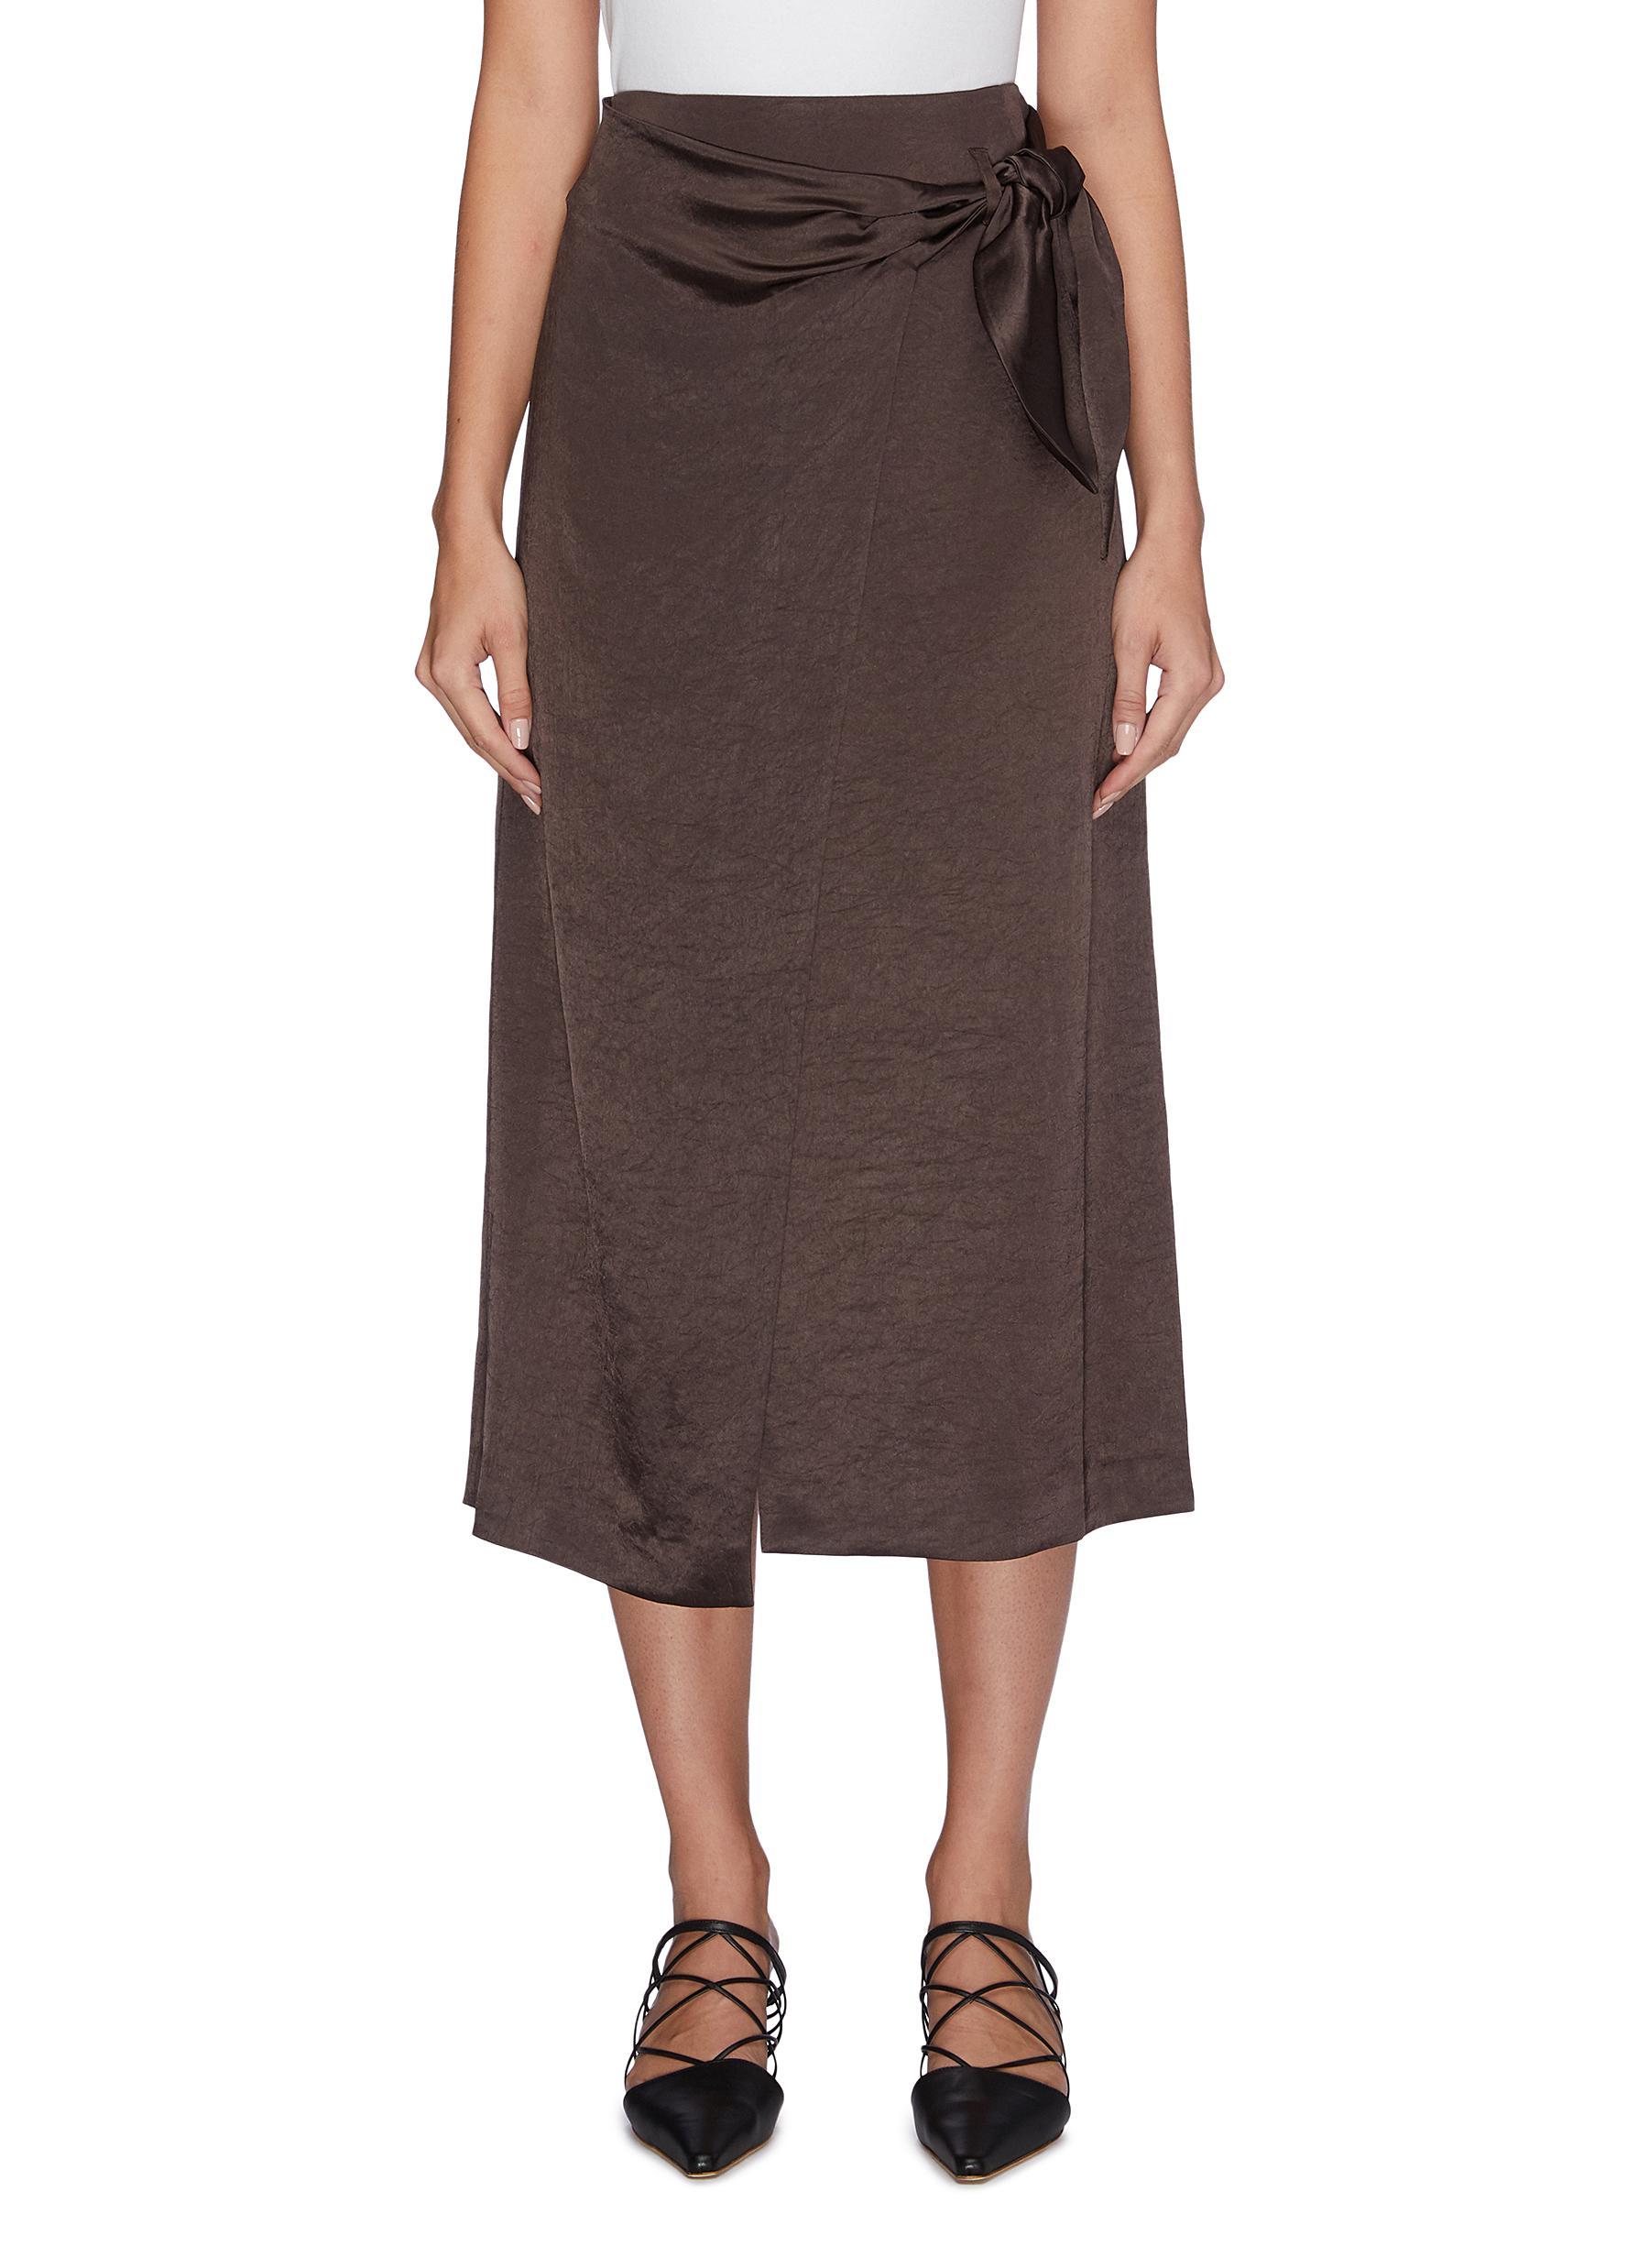 Amas satin midi skirt by Nanushka